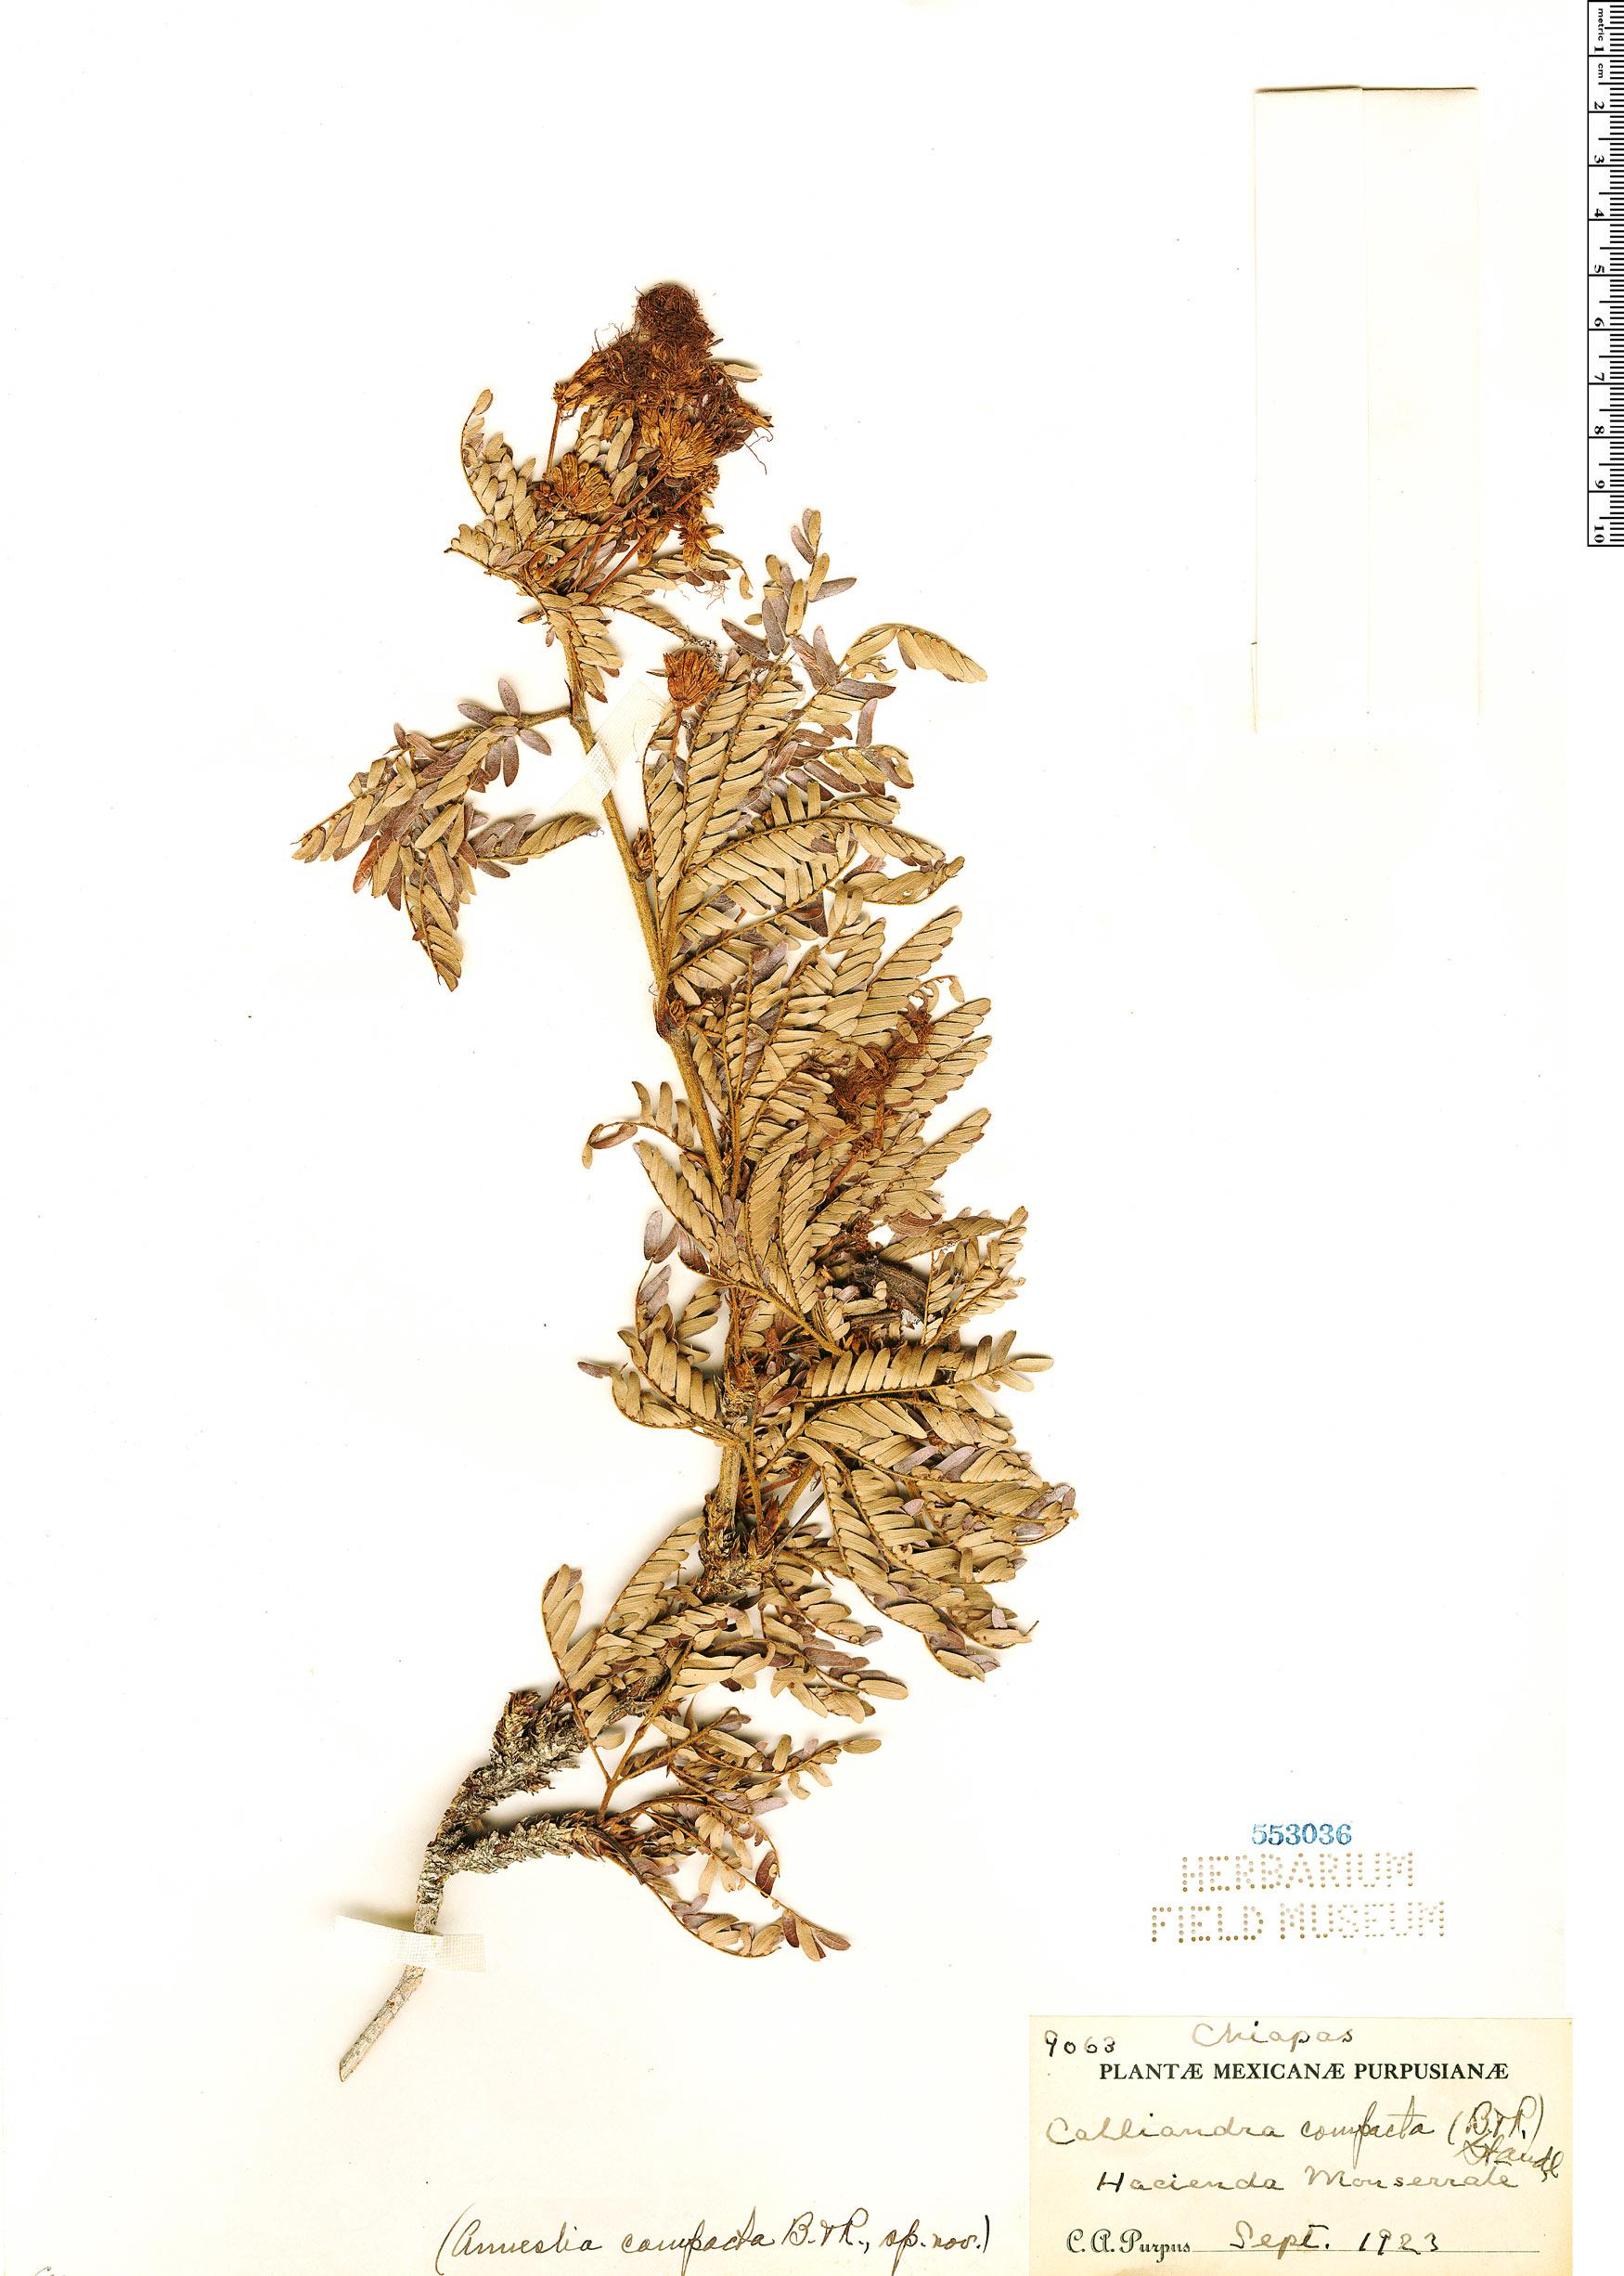 Specimen: Calliandra compacta